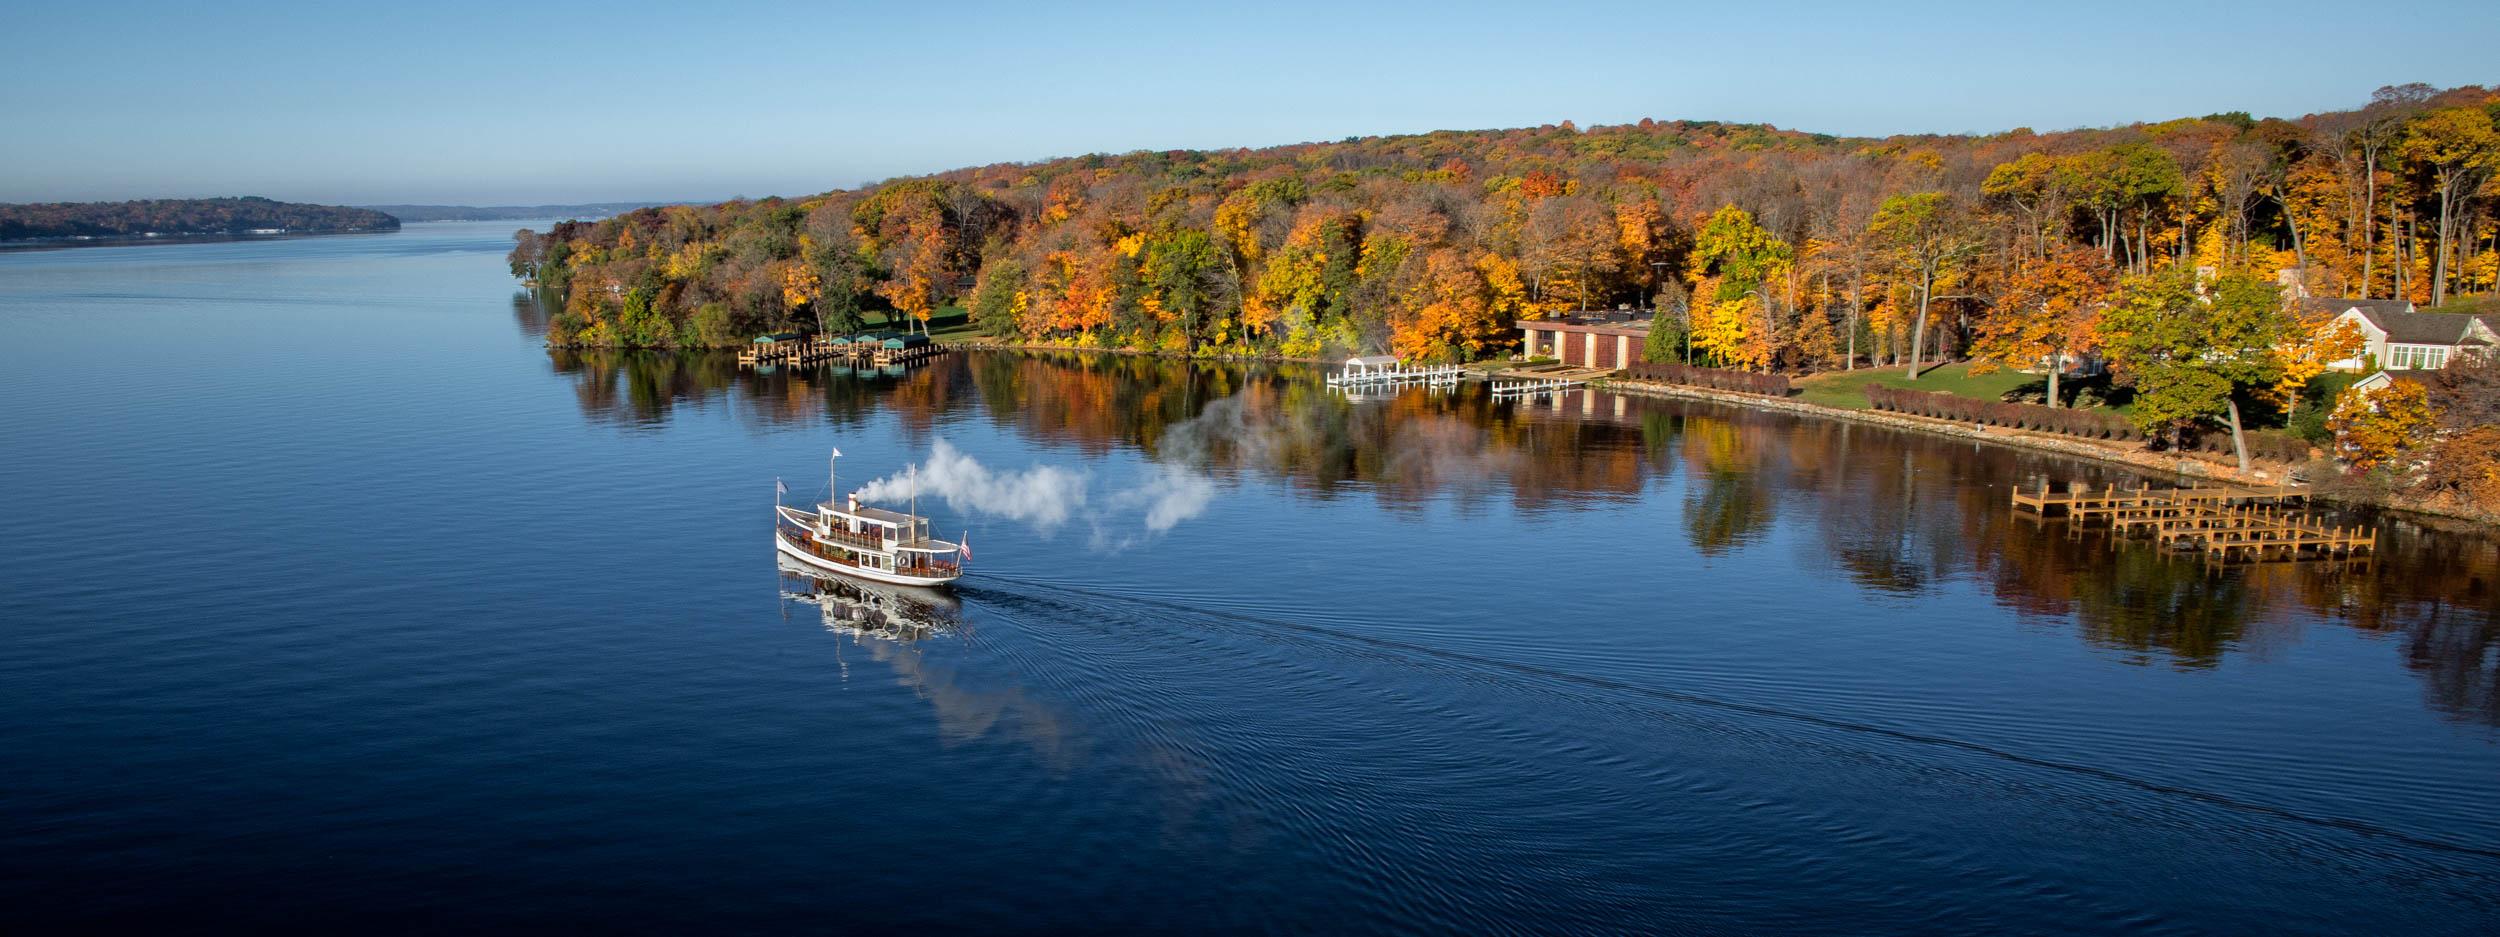 Lake Geneva Cruise Line 3.jpg